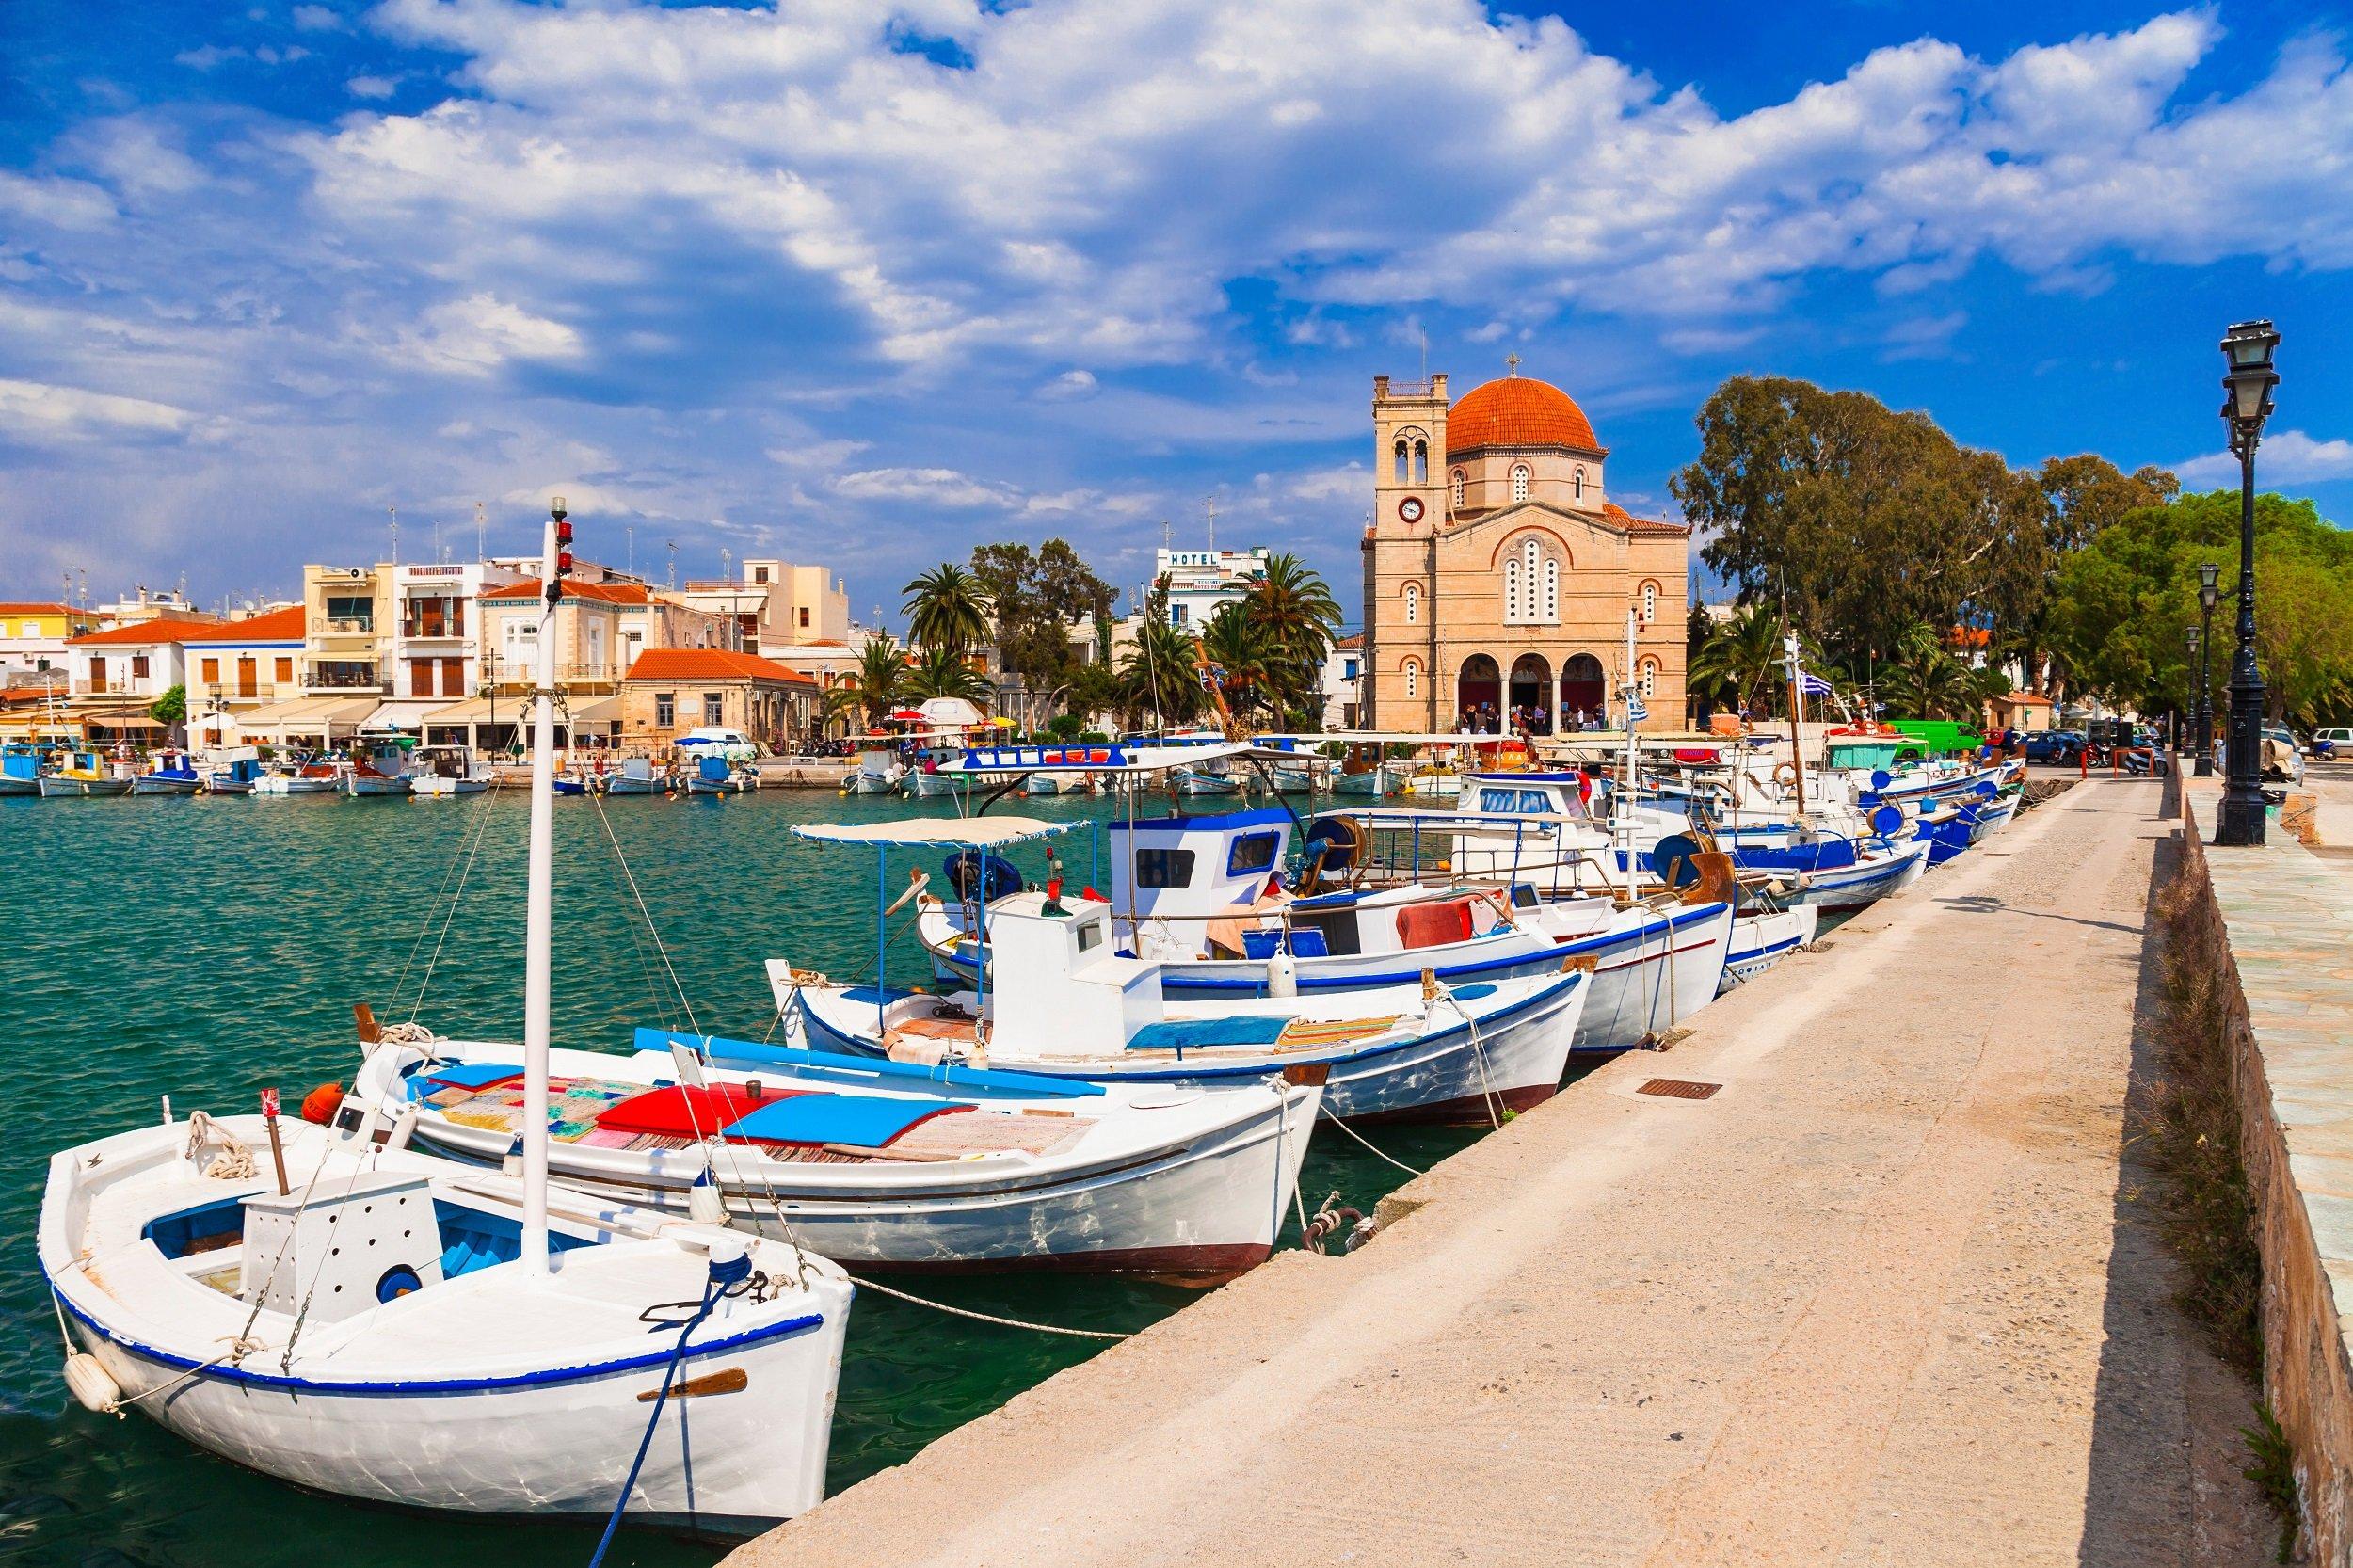 Aegina- Athens 5 Day City Break Tour Package